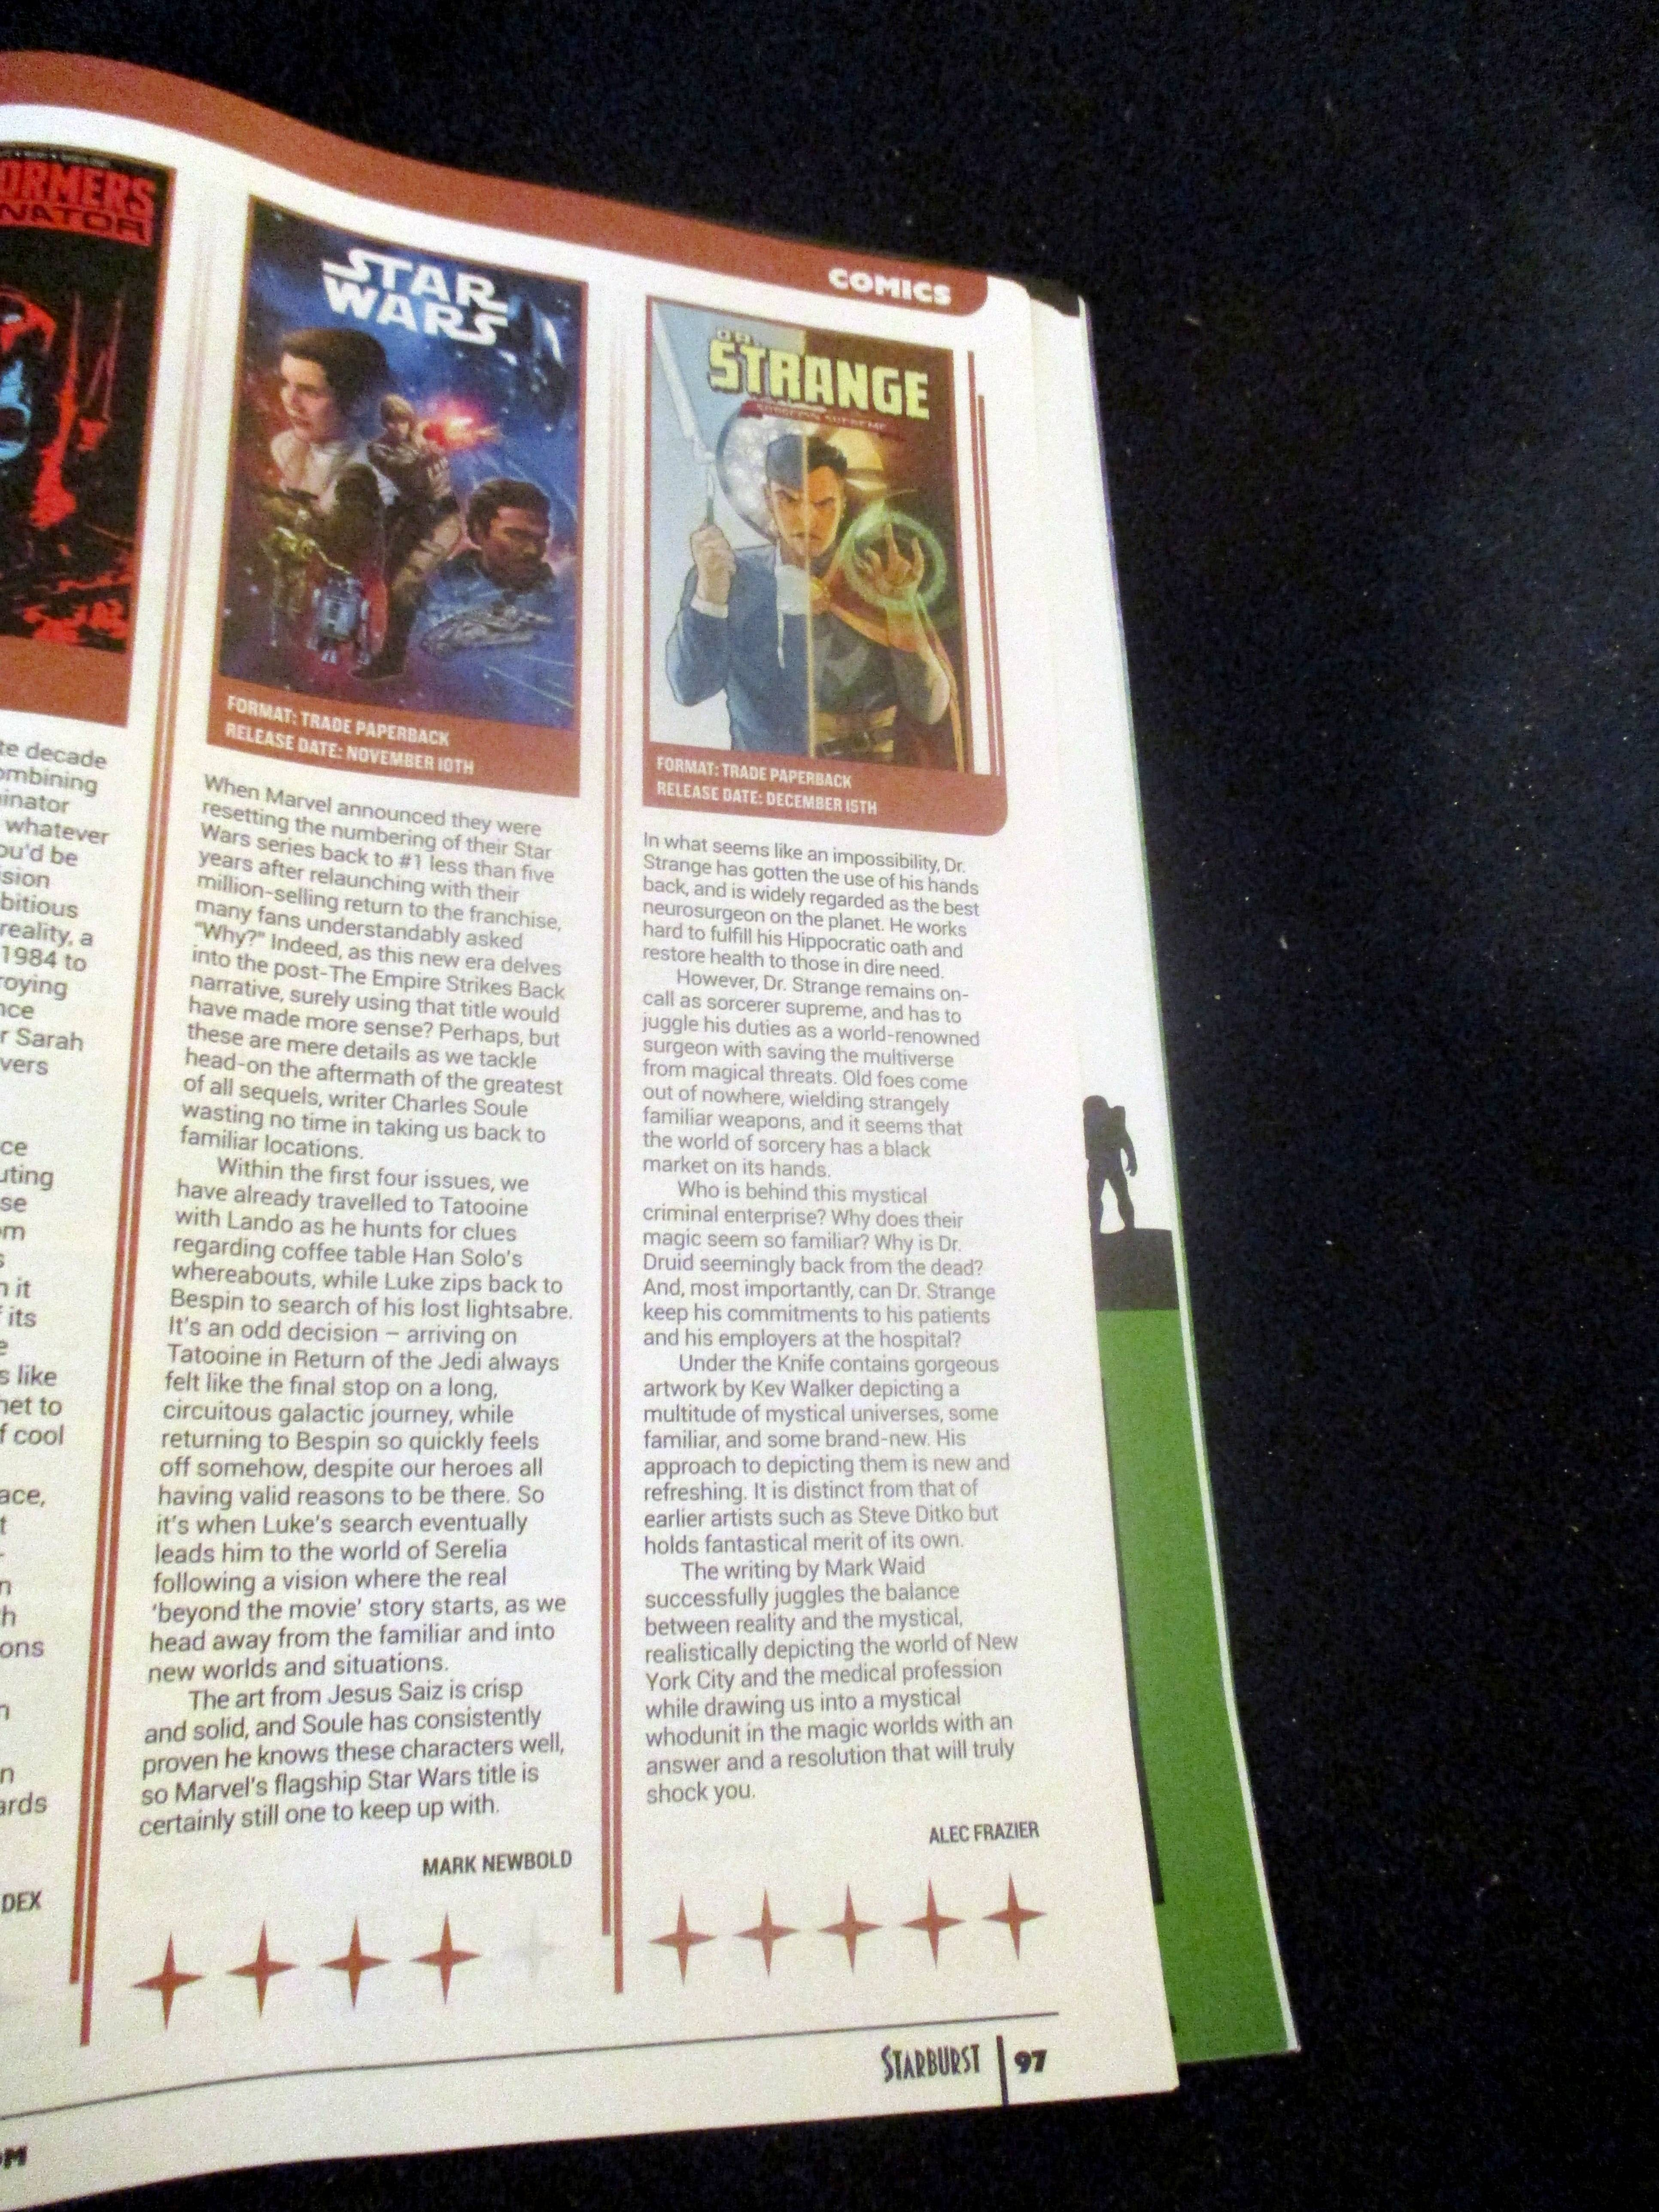 Review of Doctor Strange: Surgeon Supreme in Starburst Magazine #475: The Mandalorian Collectors¿ Edition at The Wombatorium 2.0: A Capital IdeaStarburst Magazine #475: The Mandalorian Collectors¿ Edition at The Wombatorium 2.0: A Capital Idea